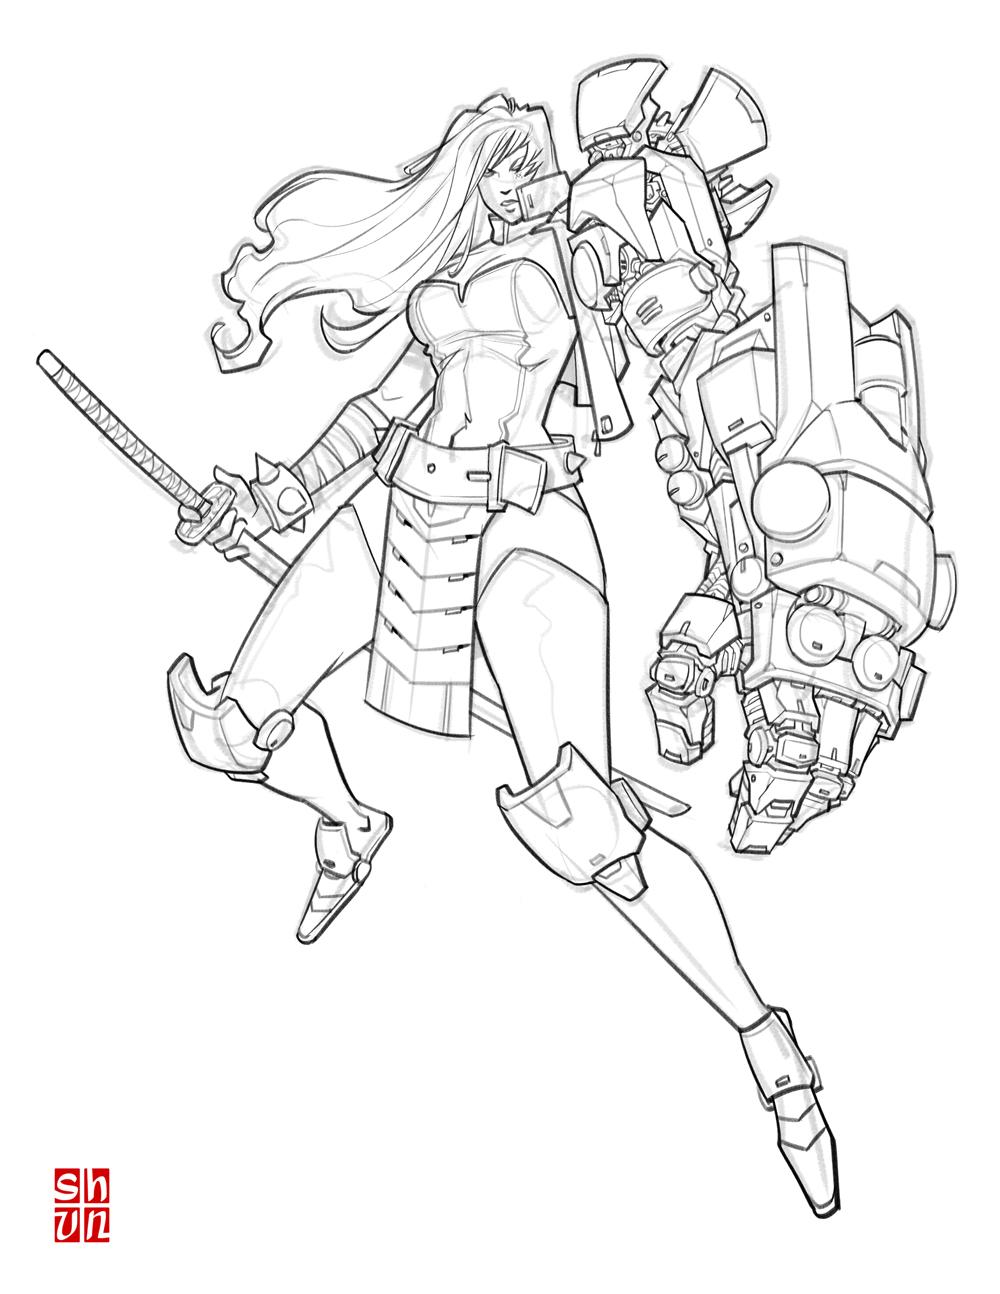 RiotShell Test 001 by Shun-008